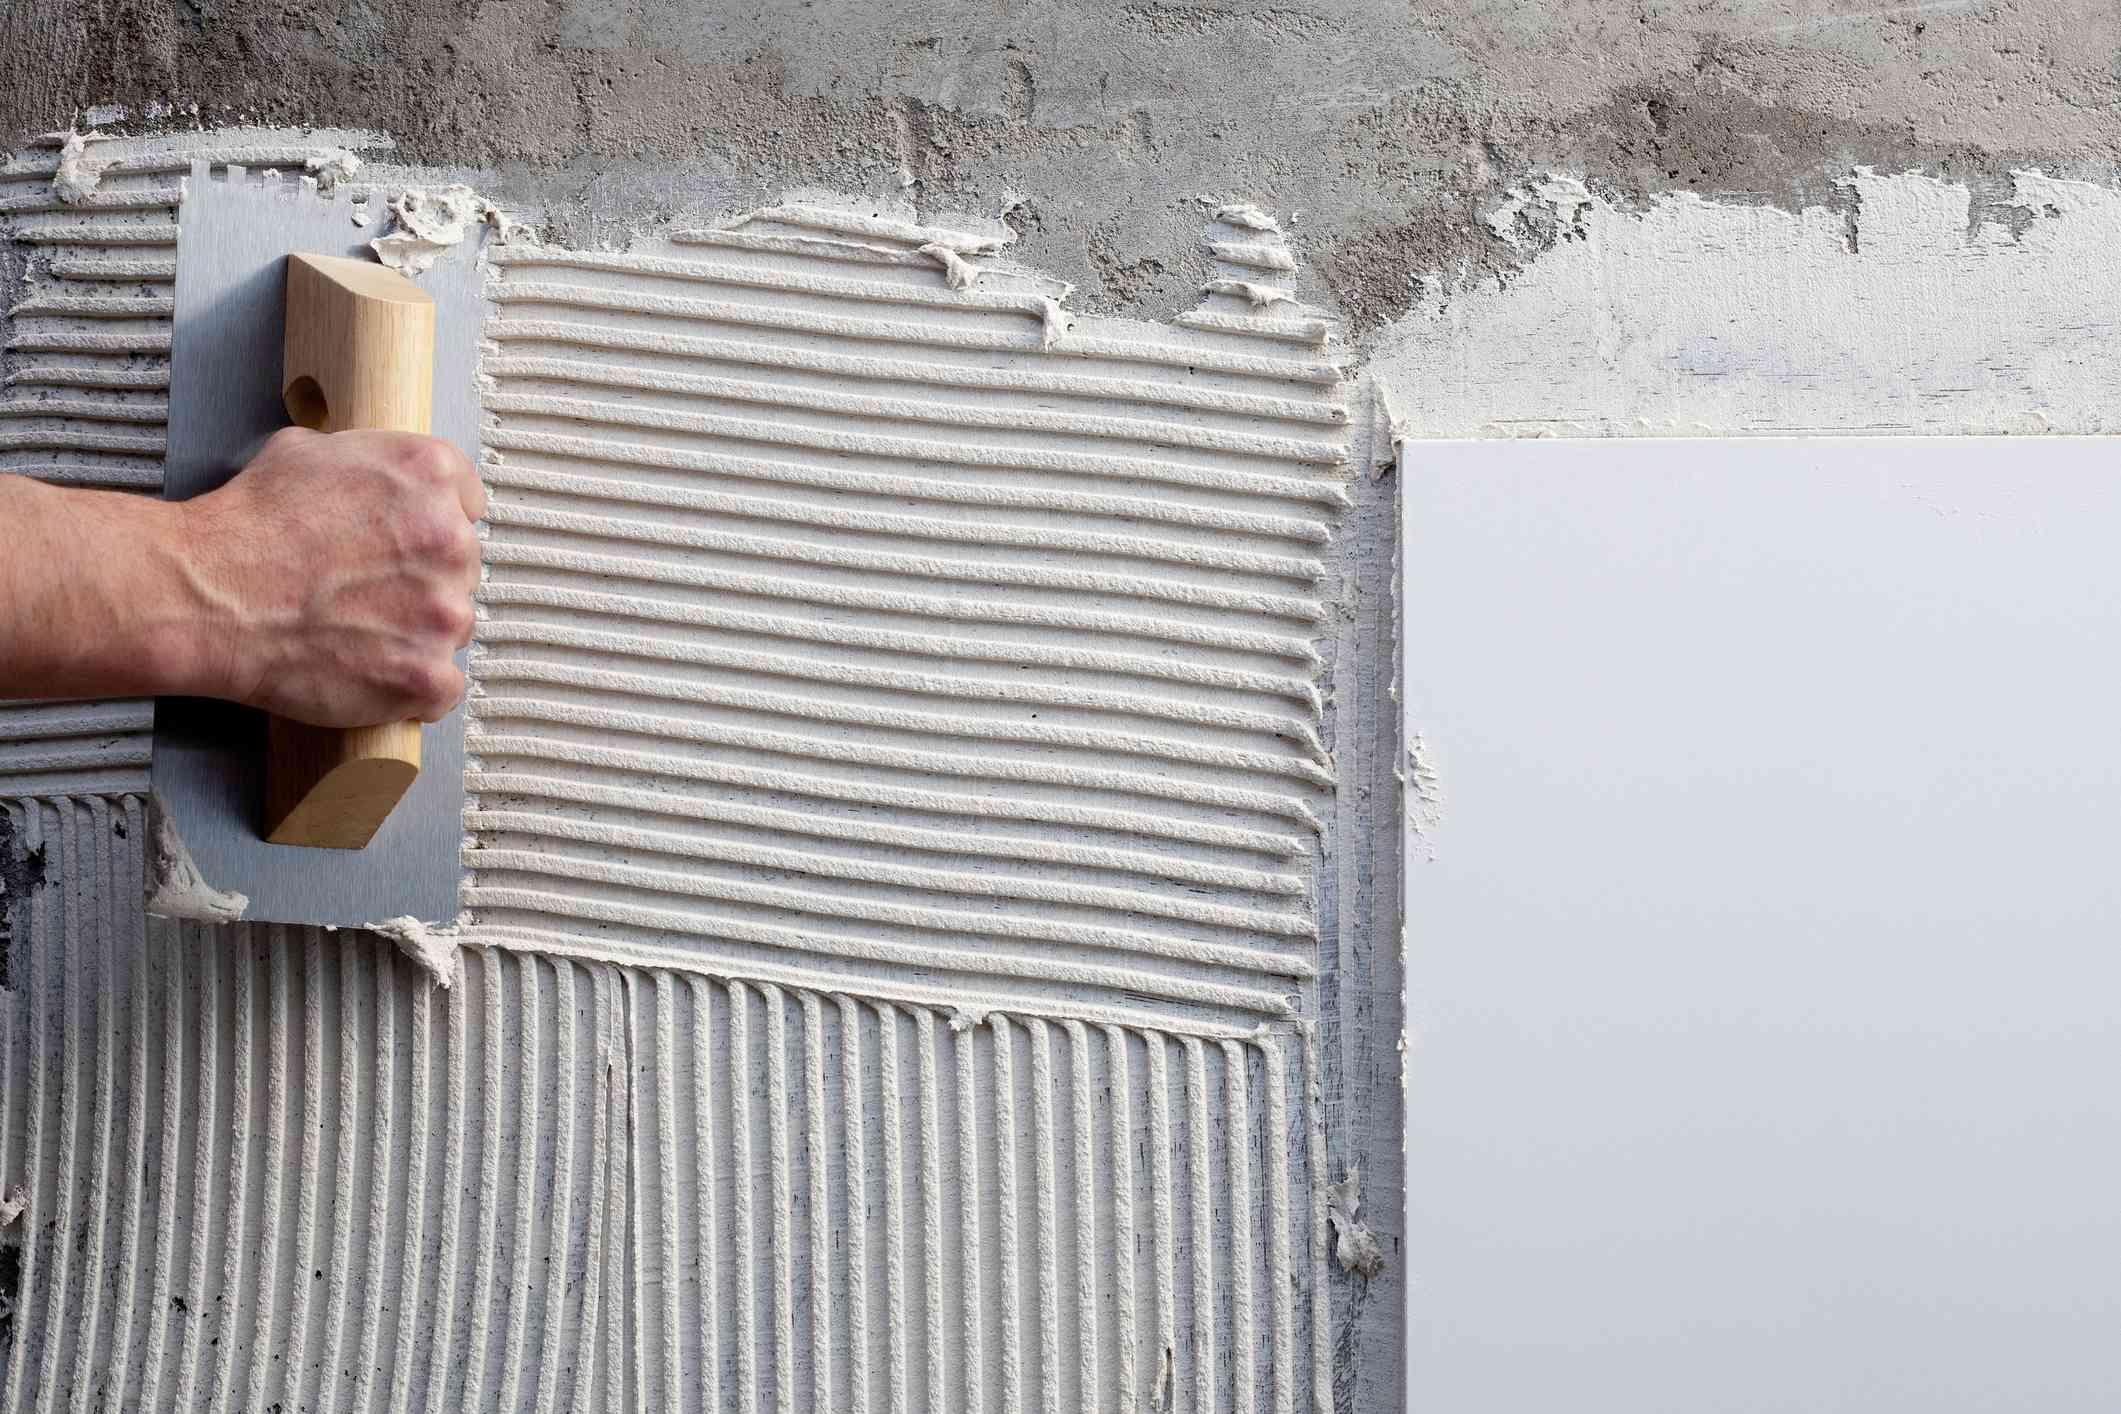 Construction worker using trowel